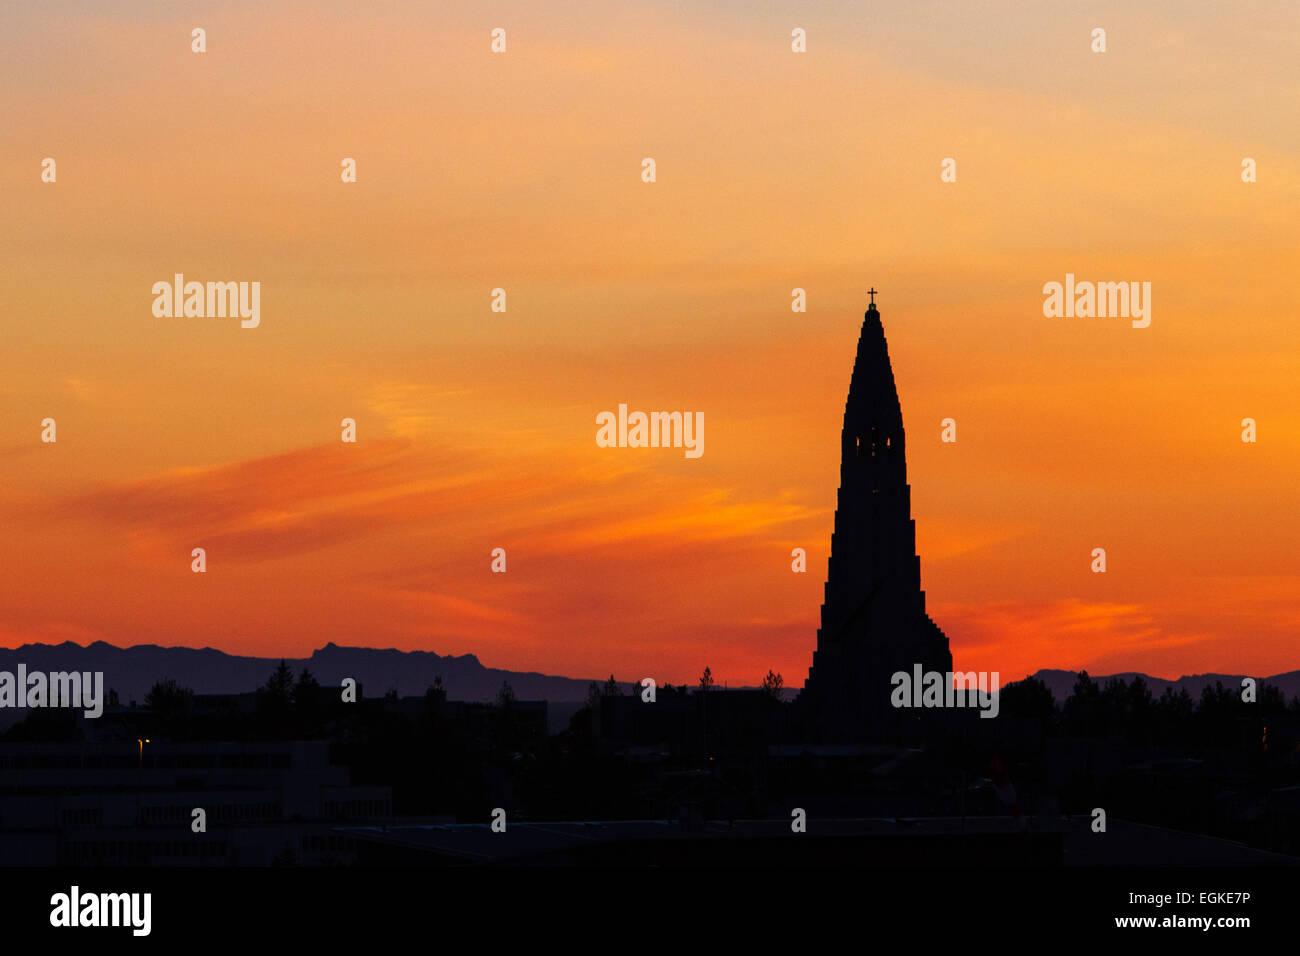 L'église Hallgrimskirkja à Reykjavik, Islande, pendant le coucher du soleil en juillet. Banque D'Images